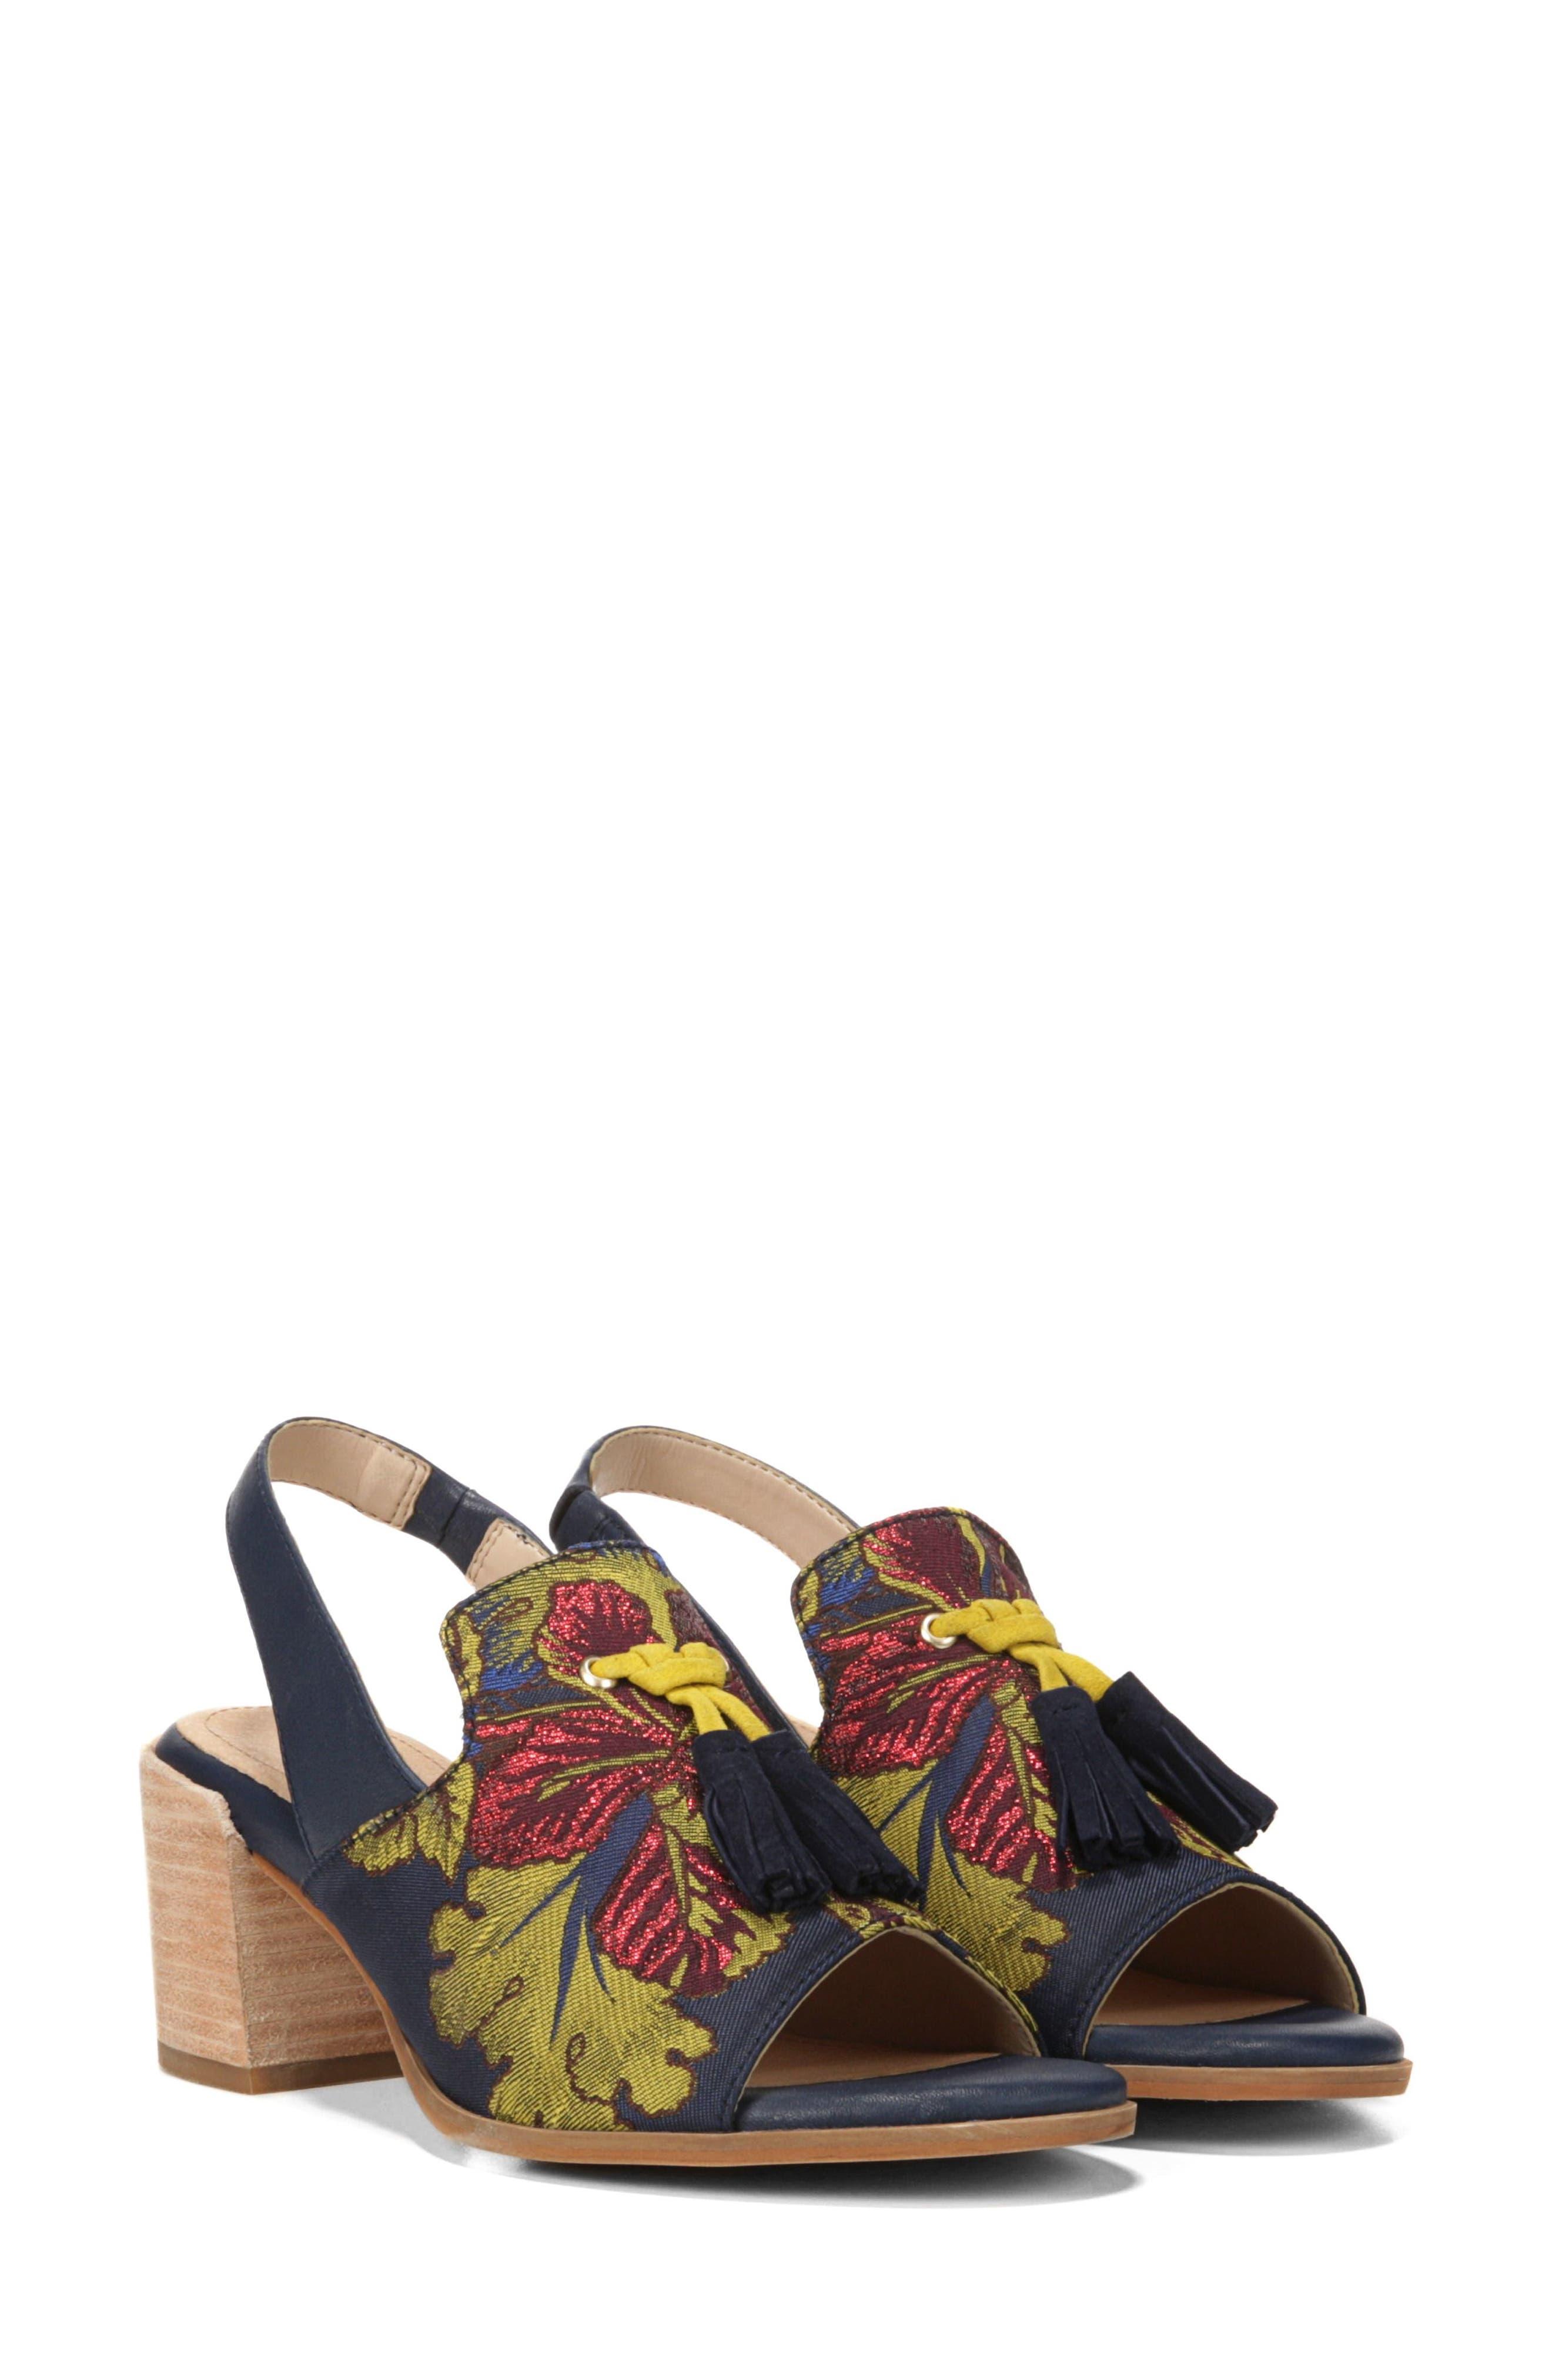 Meko Slingback Sandal,                             Alternate thumbnail 8, color,                             400